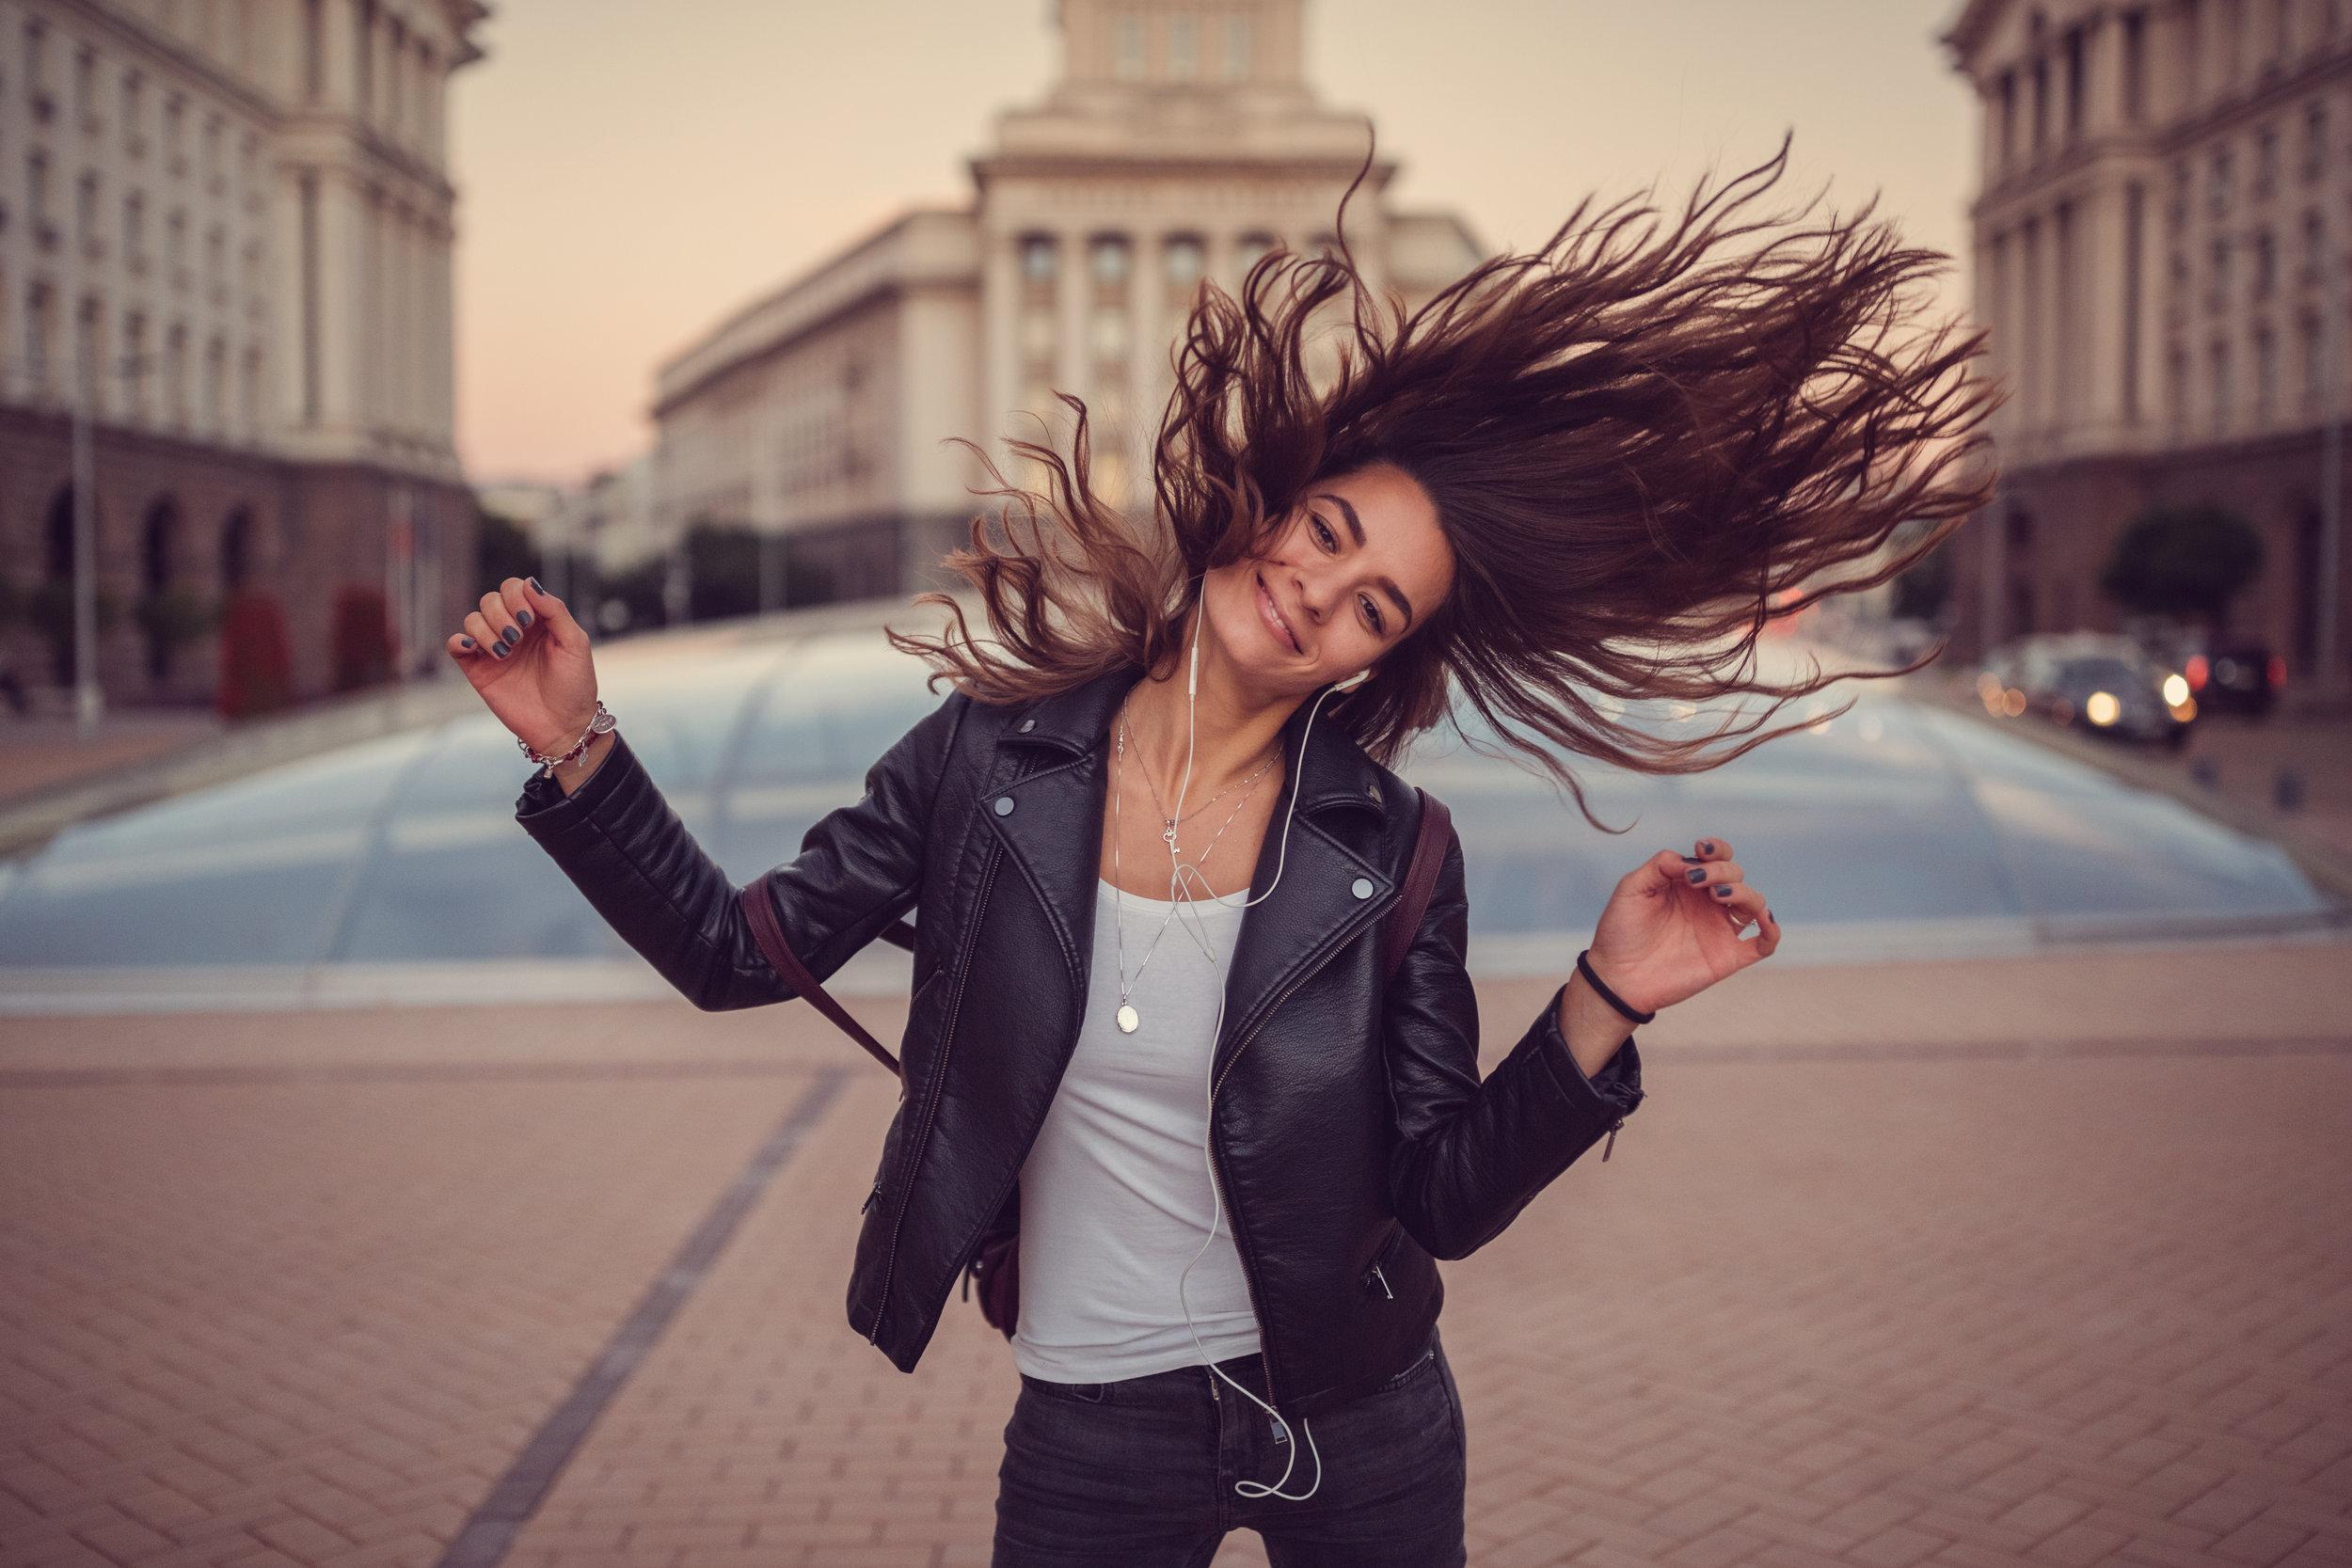 Girl-enjoying-the-music-638140468_5420x3613.jpeg